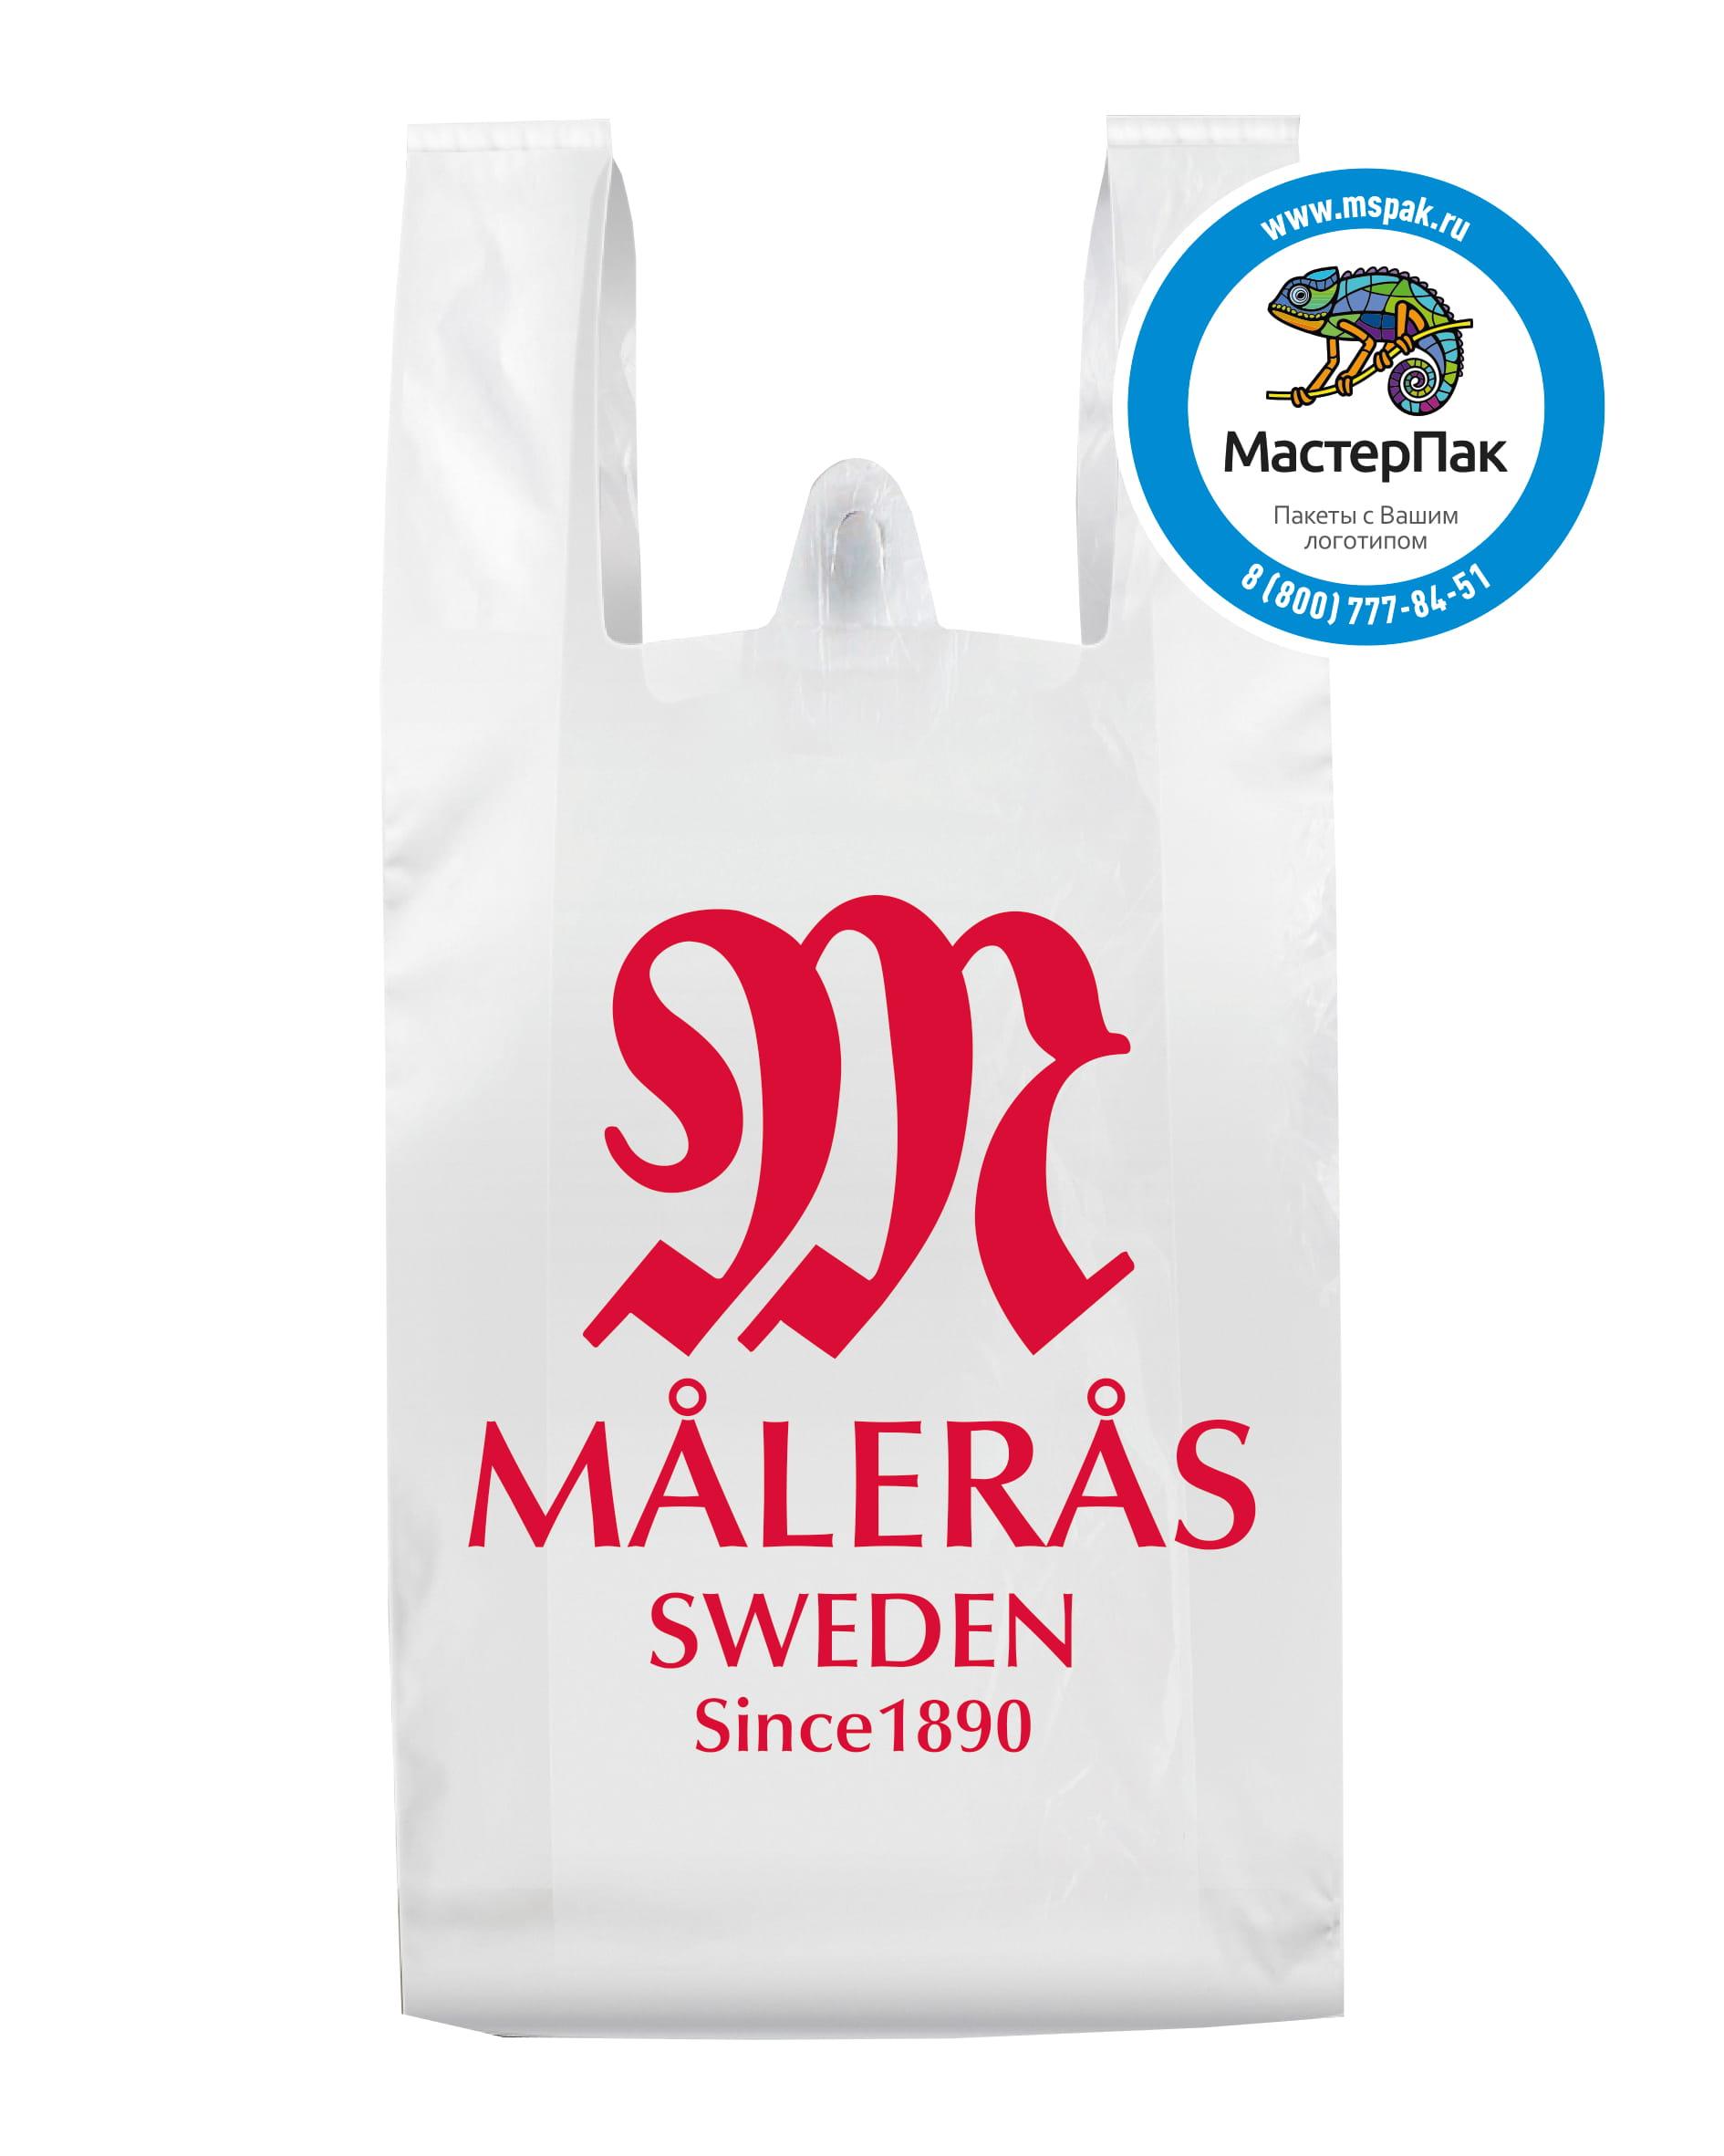 Пакет-майка ПВД с логотипом Maleras Sweden, Москва, 30 мкм, 40*60